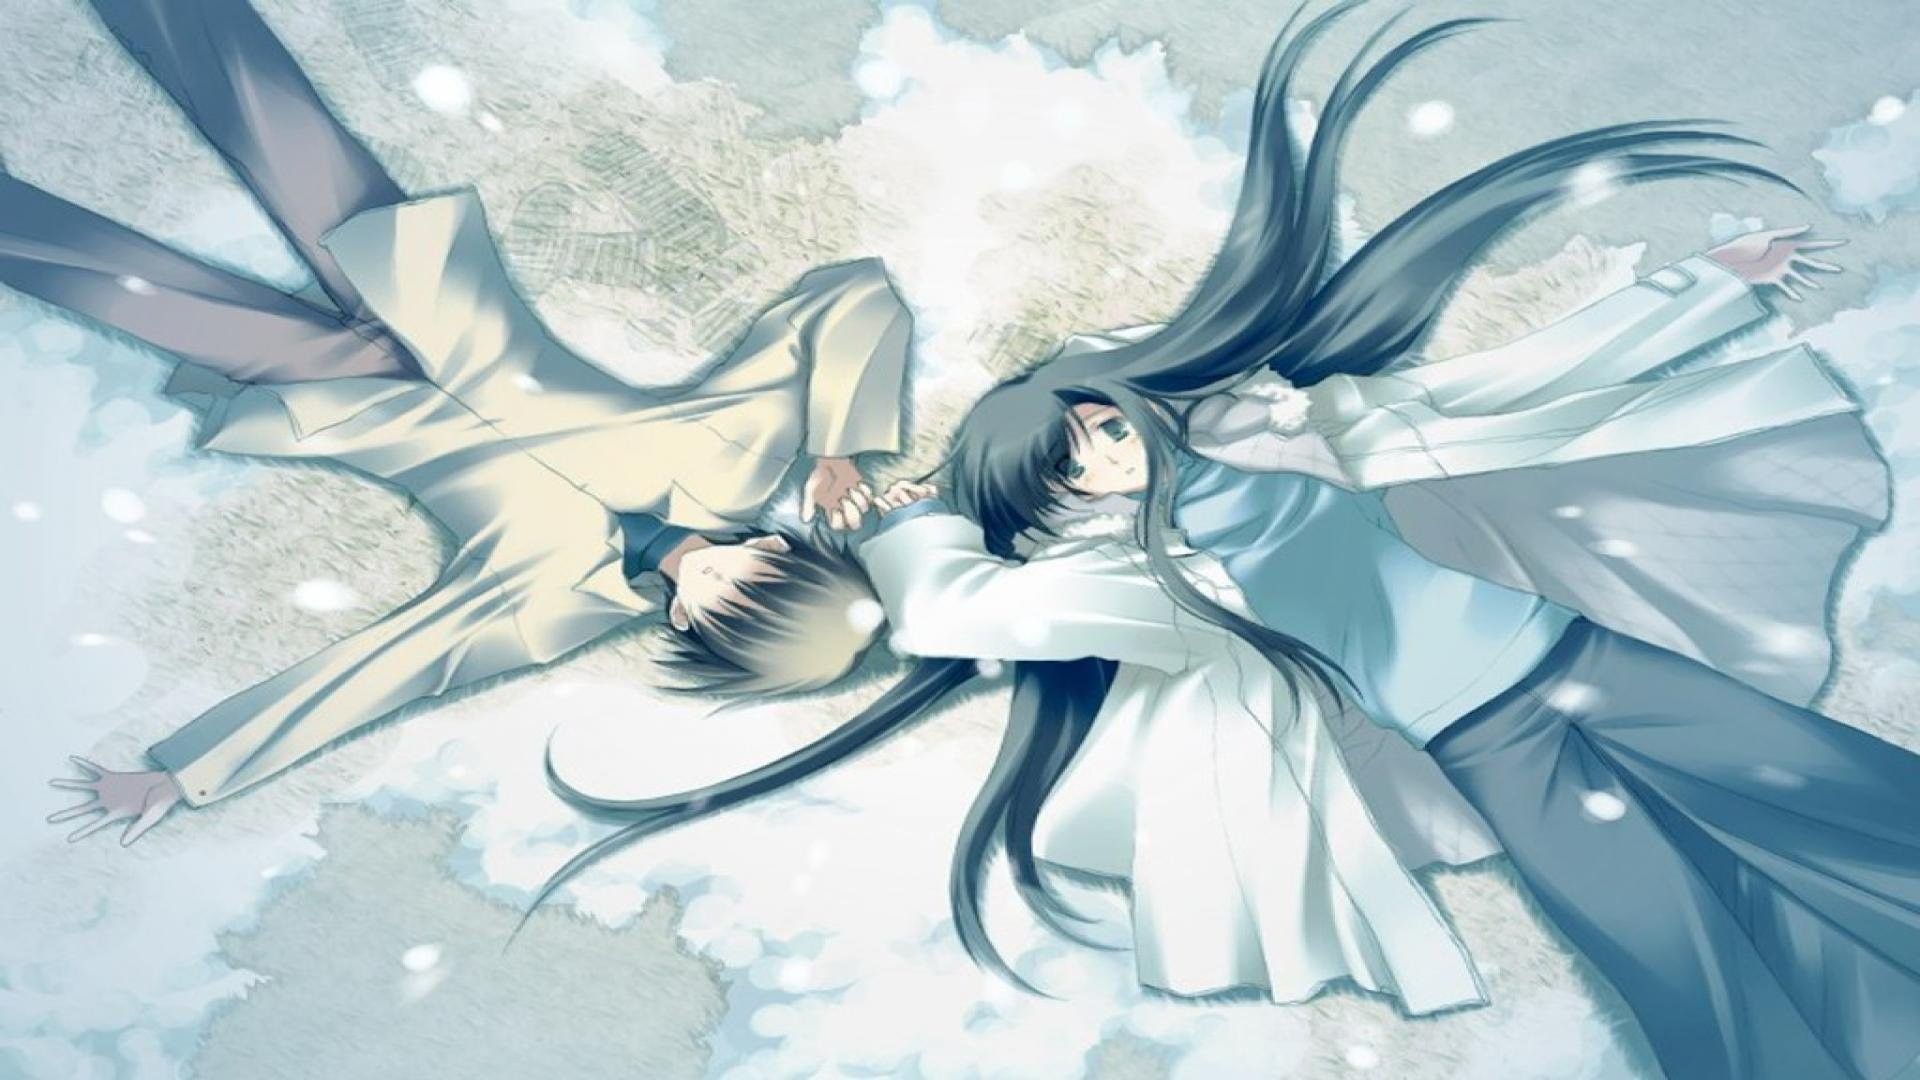 Cute Anime Couple Wallpapers Wallpaper 1280×800 Anime Couple Wallpaper (52  Wallpapers) |